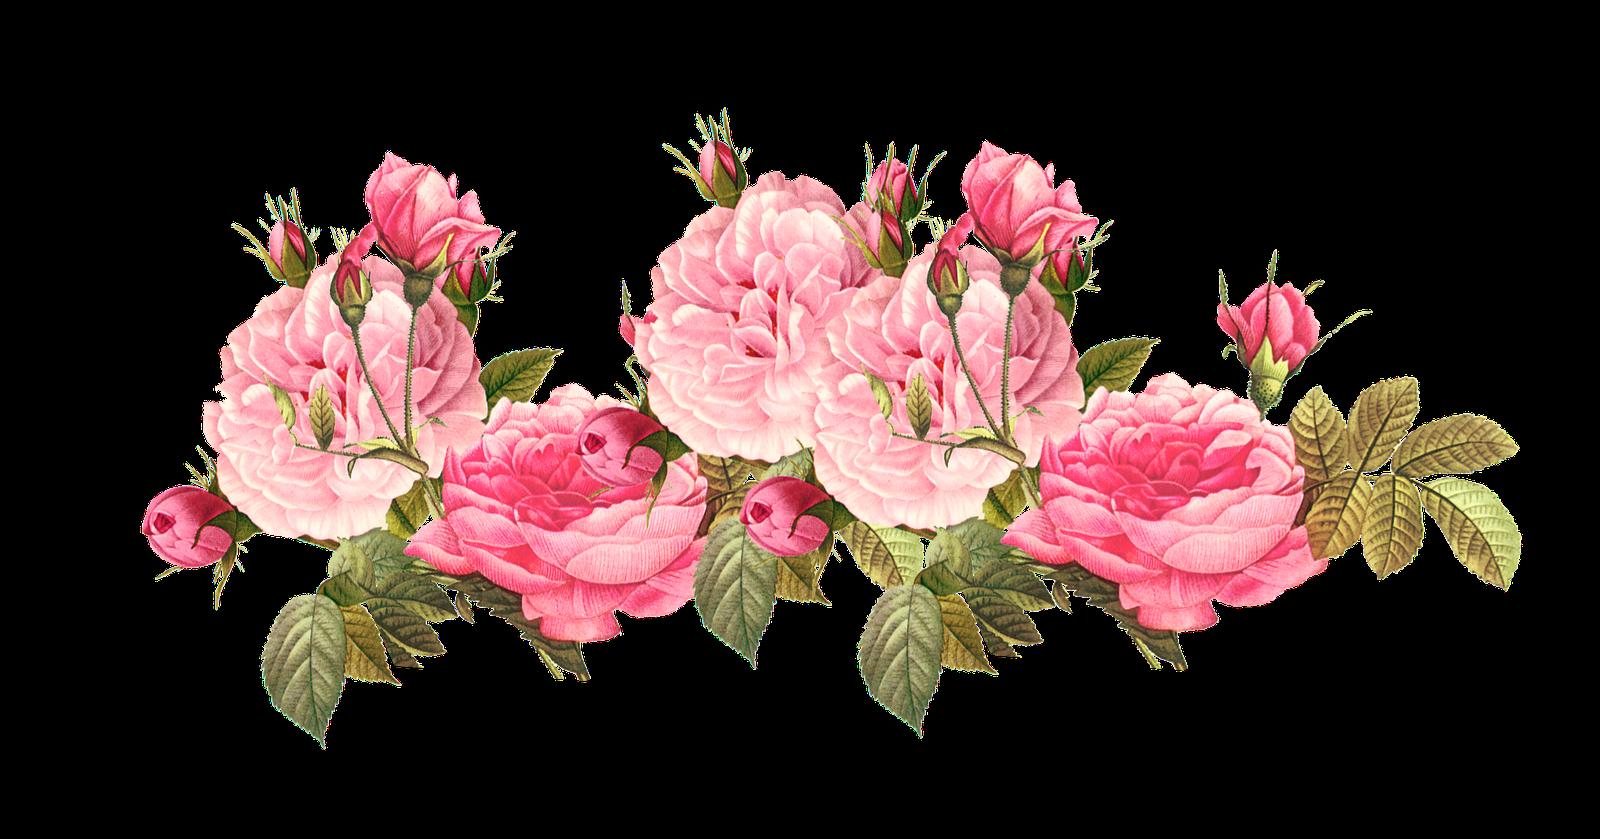 romance of roses index. Black Bedroom Furniture Sets. Home Design Ideas